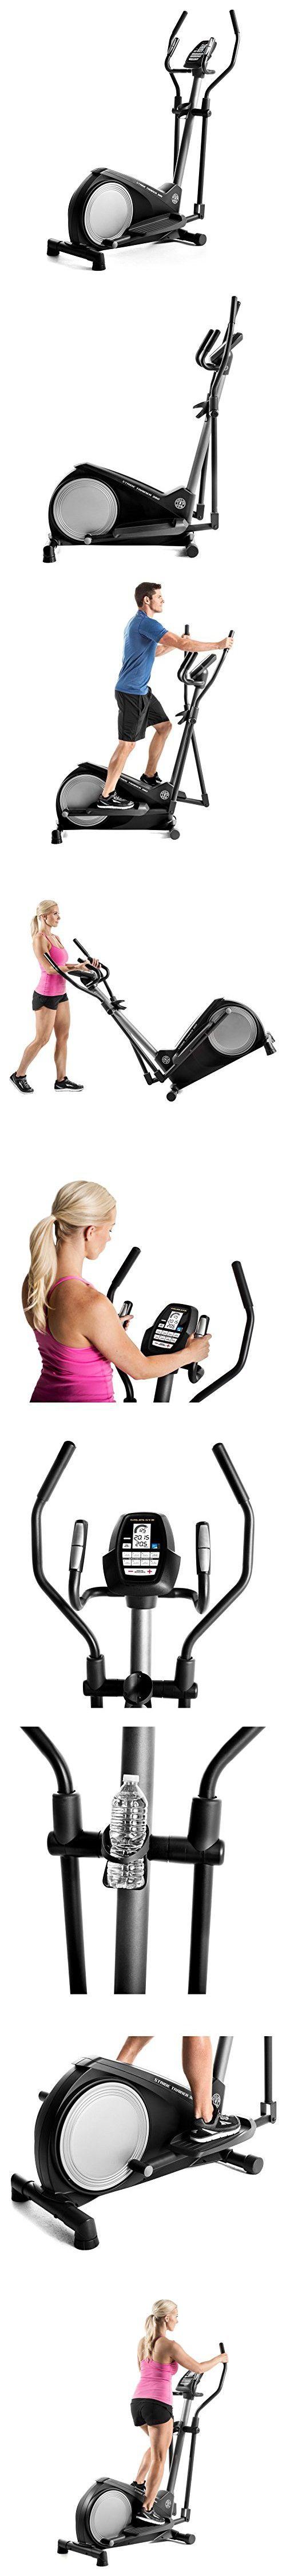 Golds Gym Stride Trainer 380 Elliptical